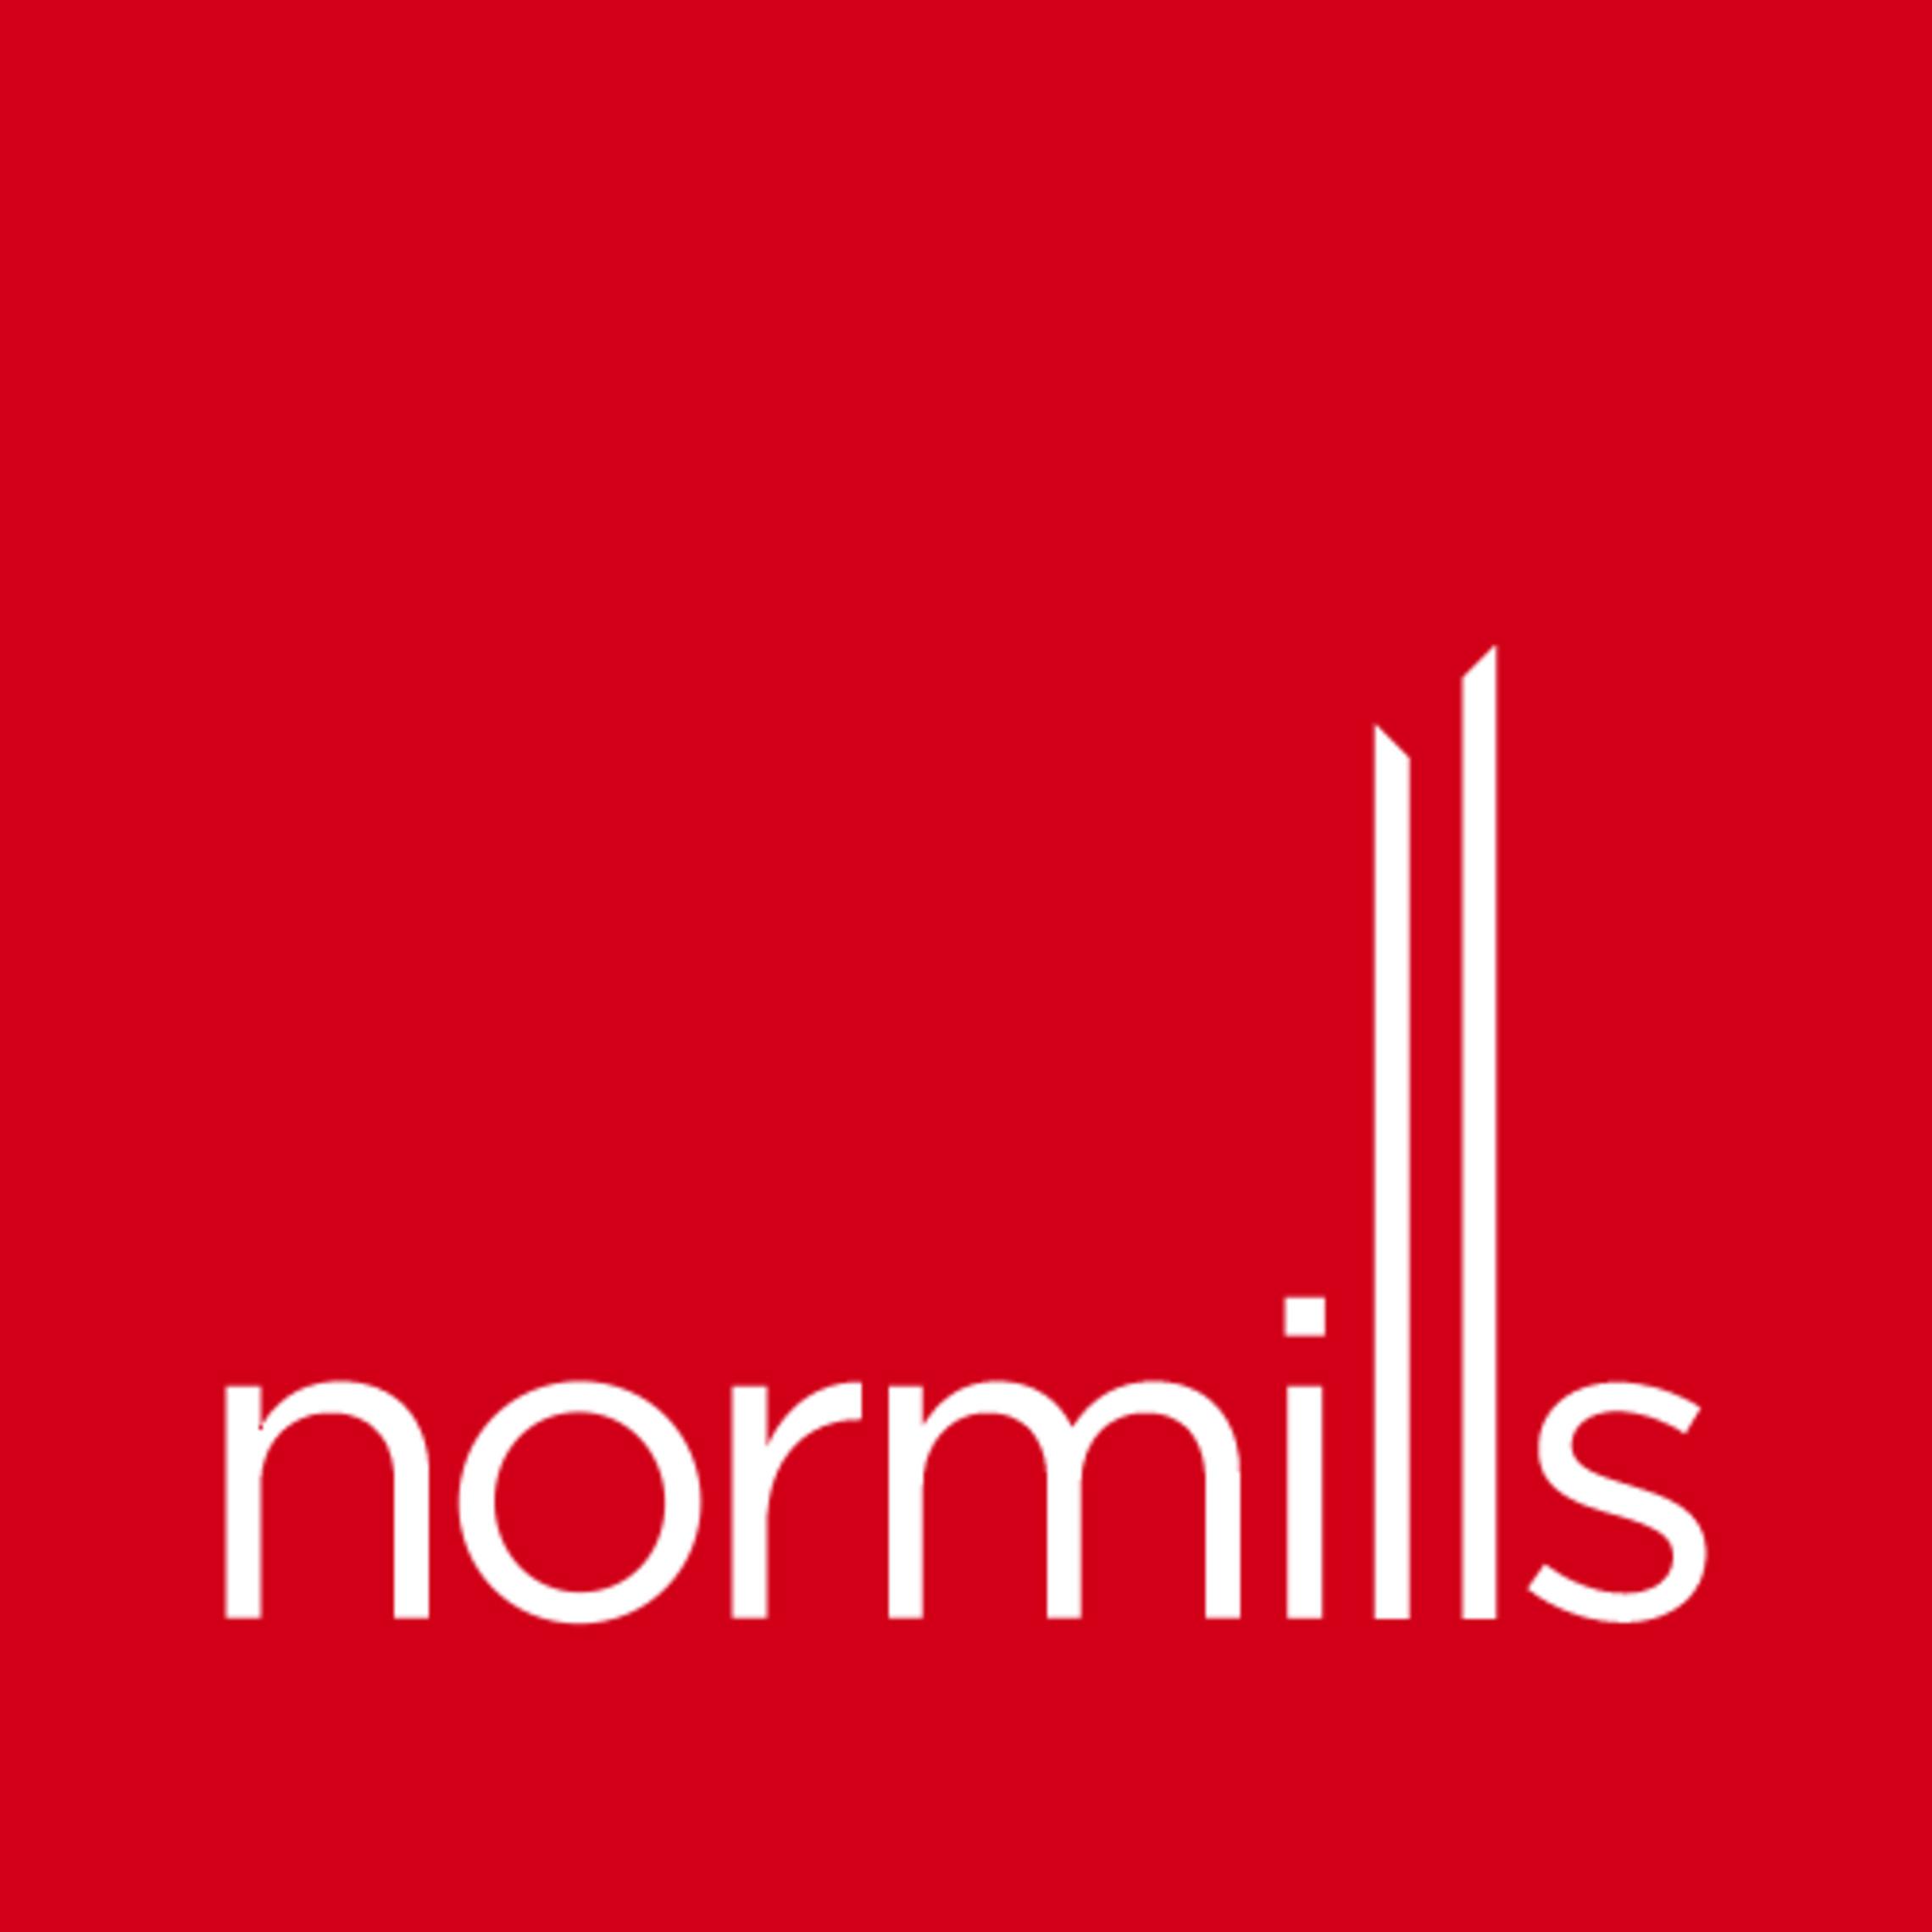 normills- company logo